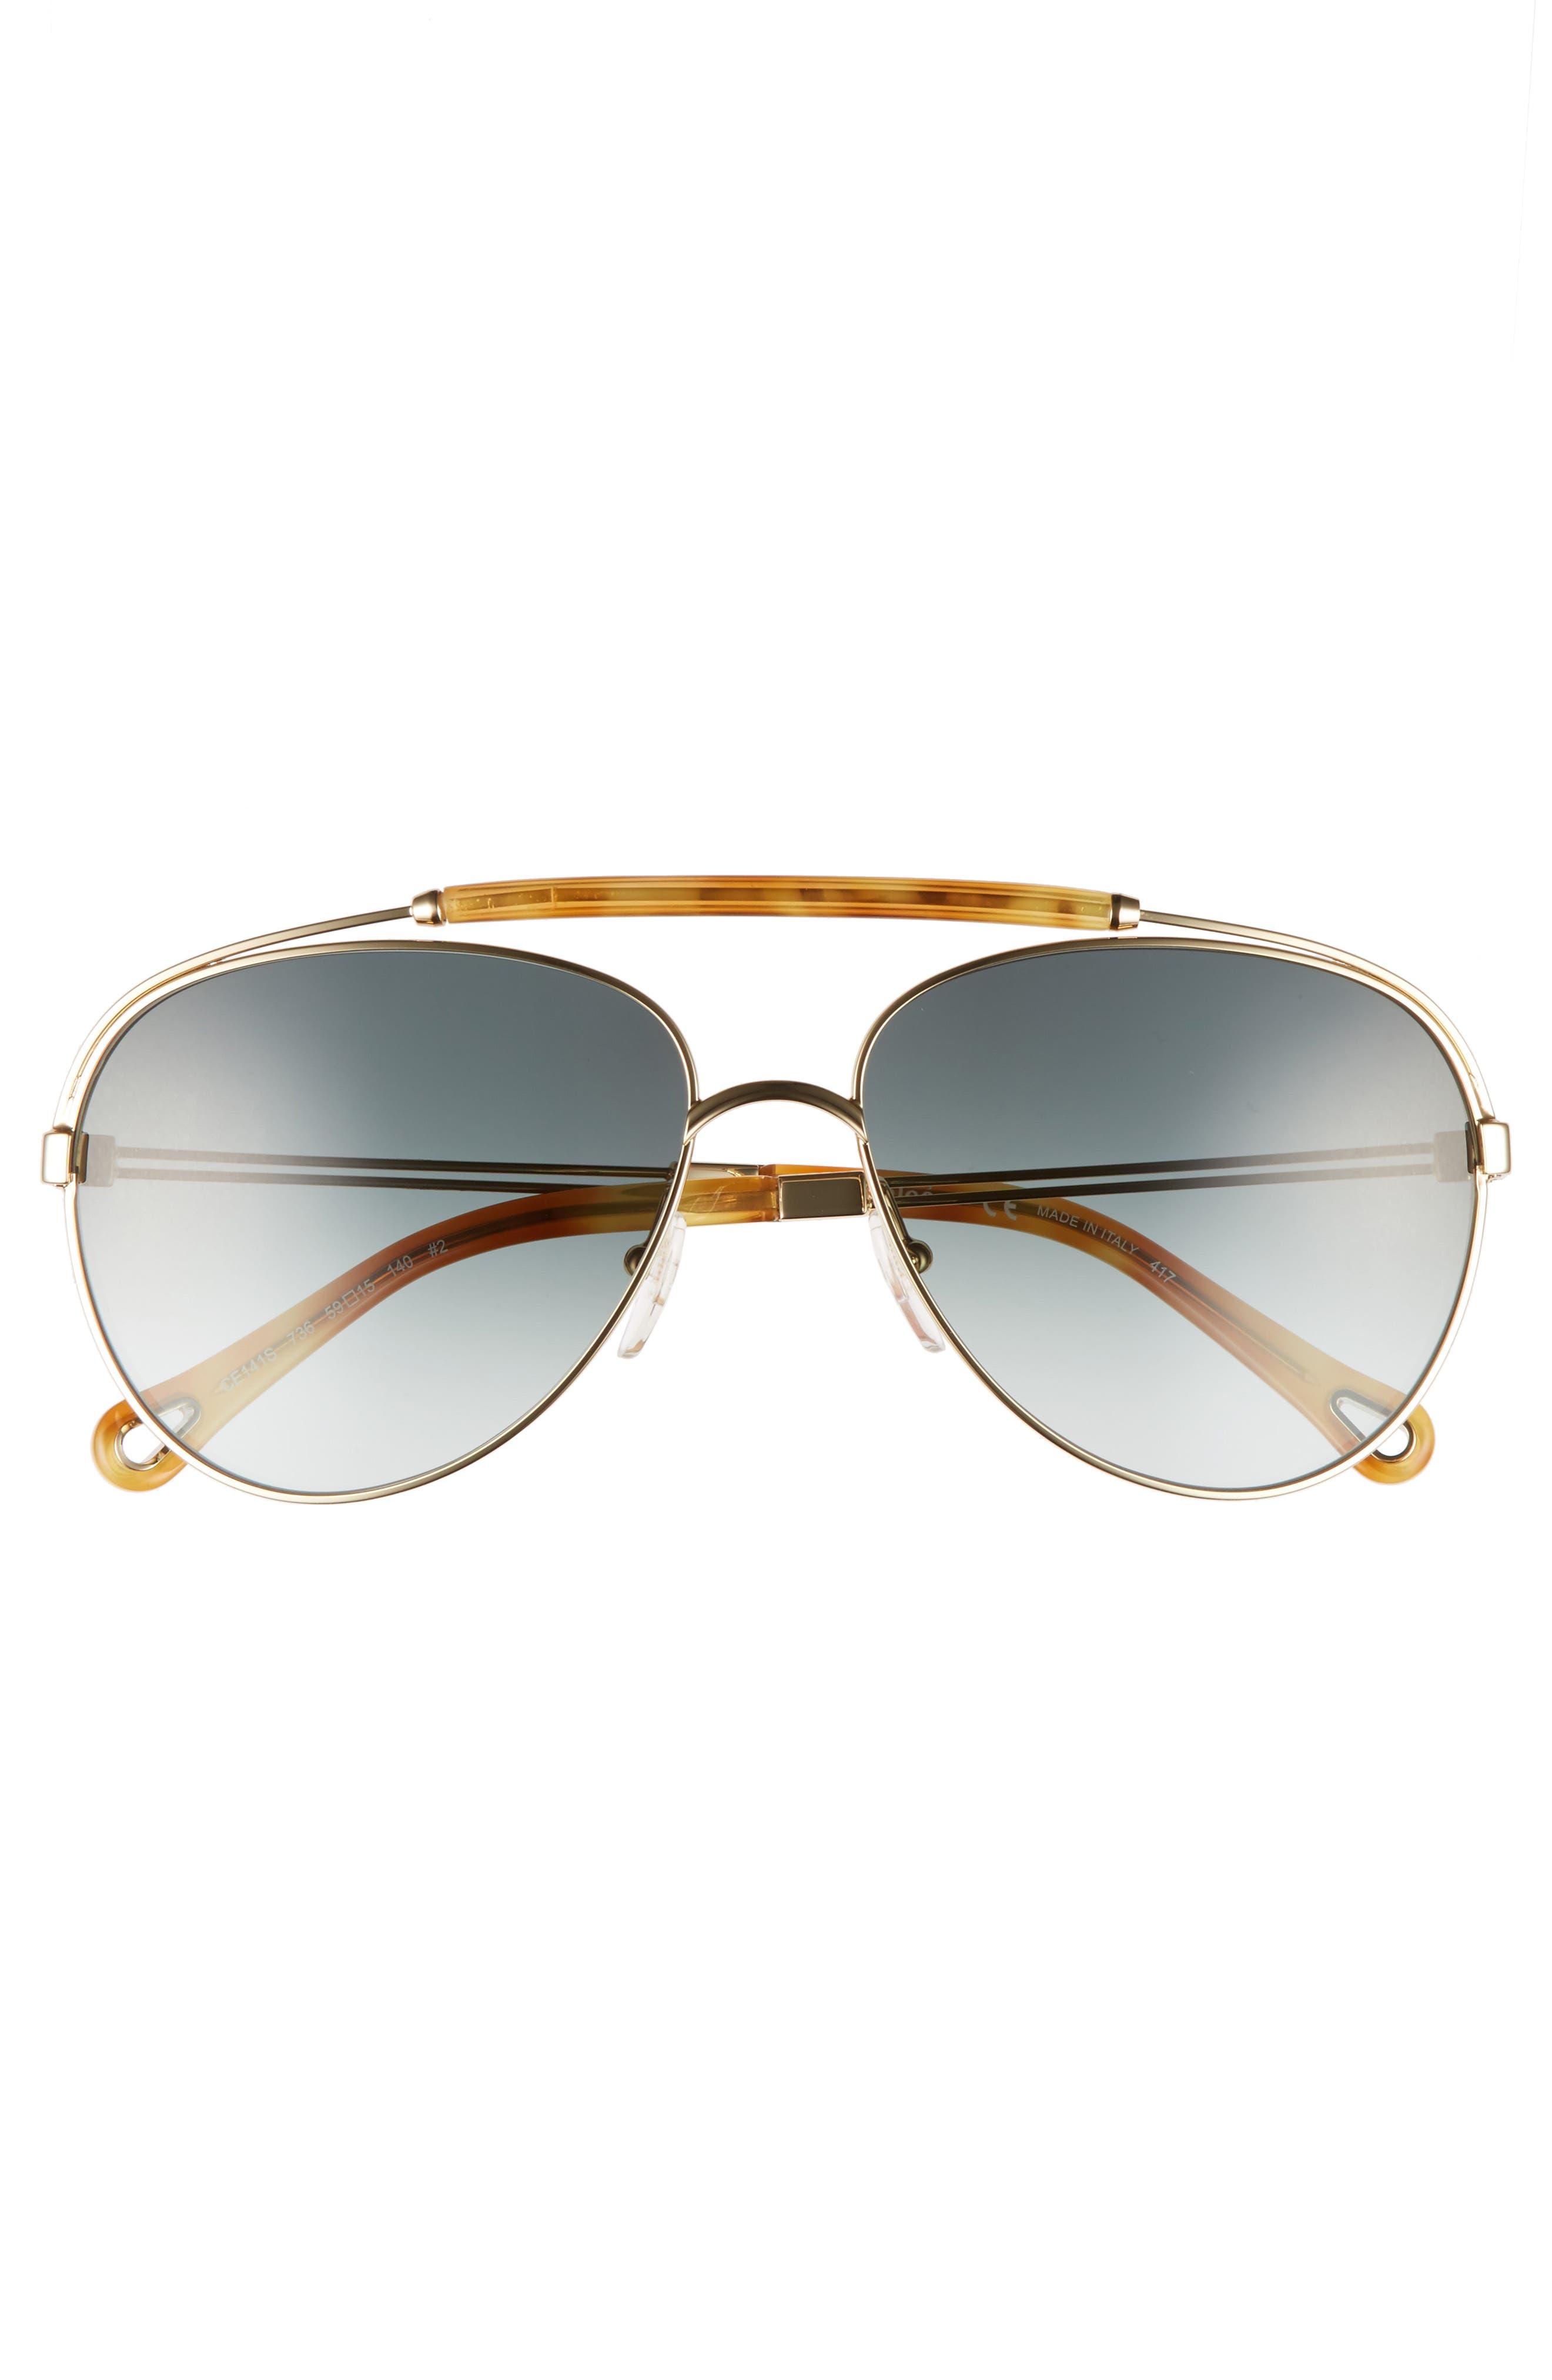 Jackie 59mm Aviator Sunglasses,                             Alternate thumbnail 3, color,                             GOLD/ BLONDE HAVANA